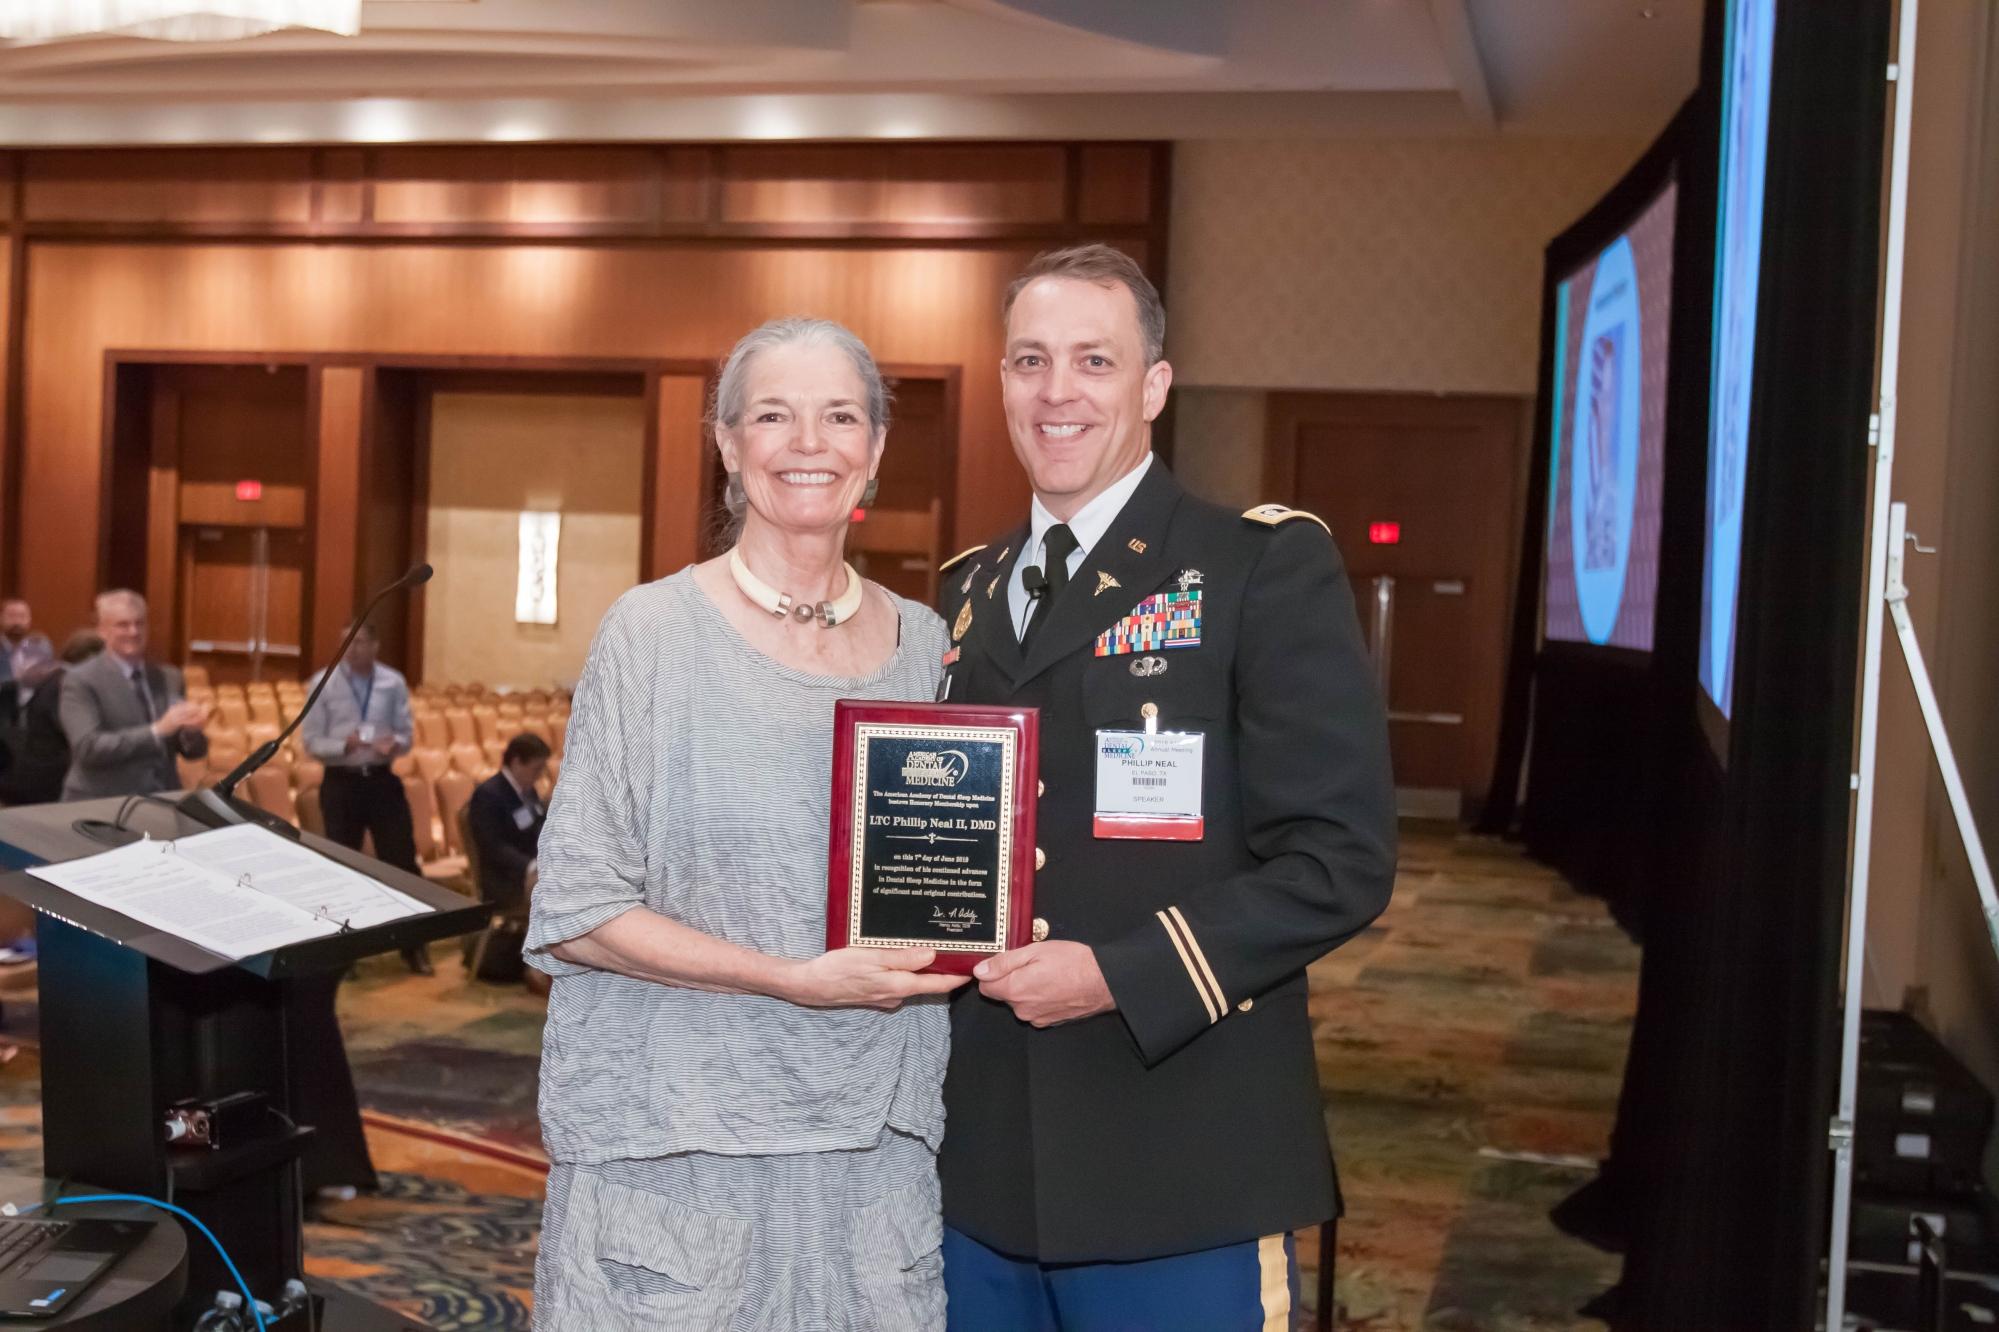 Participant winning AADSM Dental Research Award